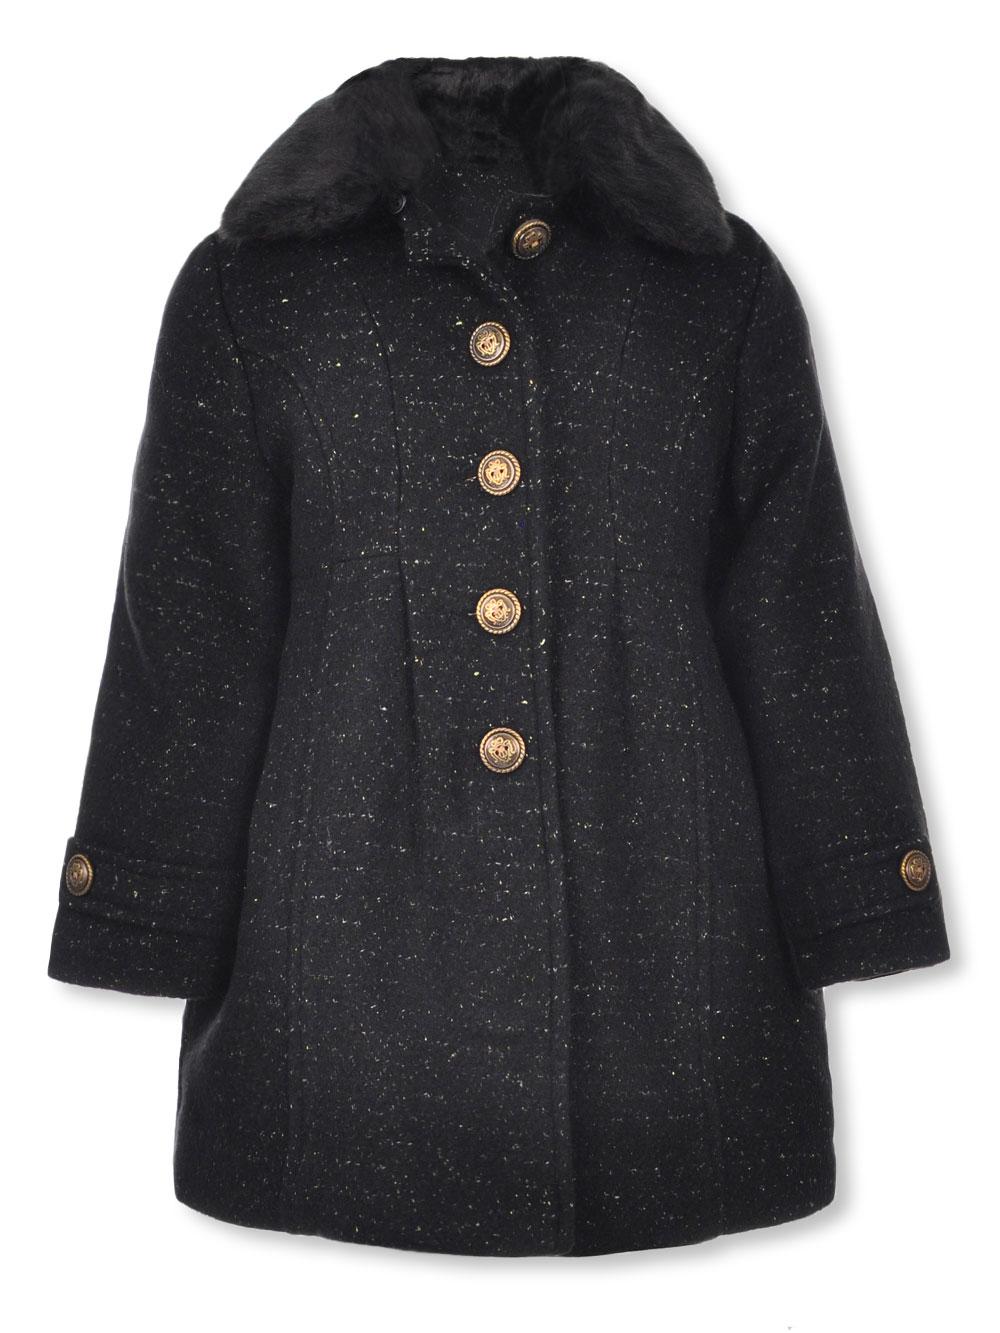 1dcfa7b7c Girls' Coat by Jessica Simpson in Black